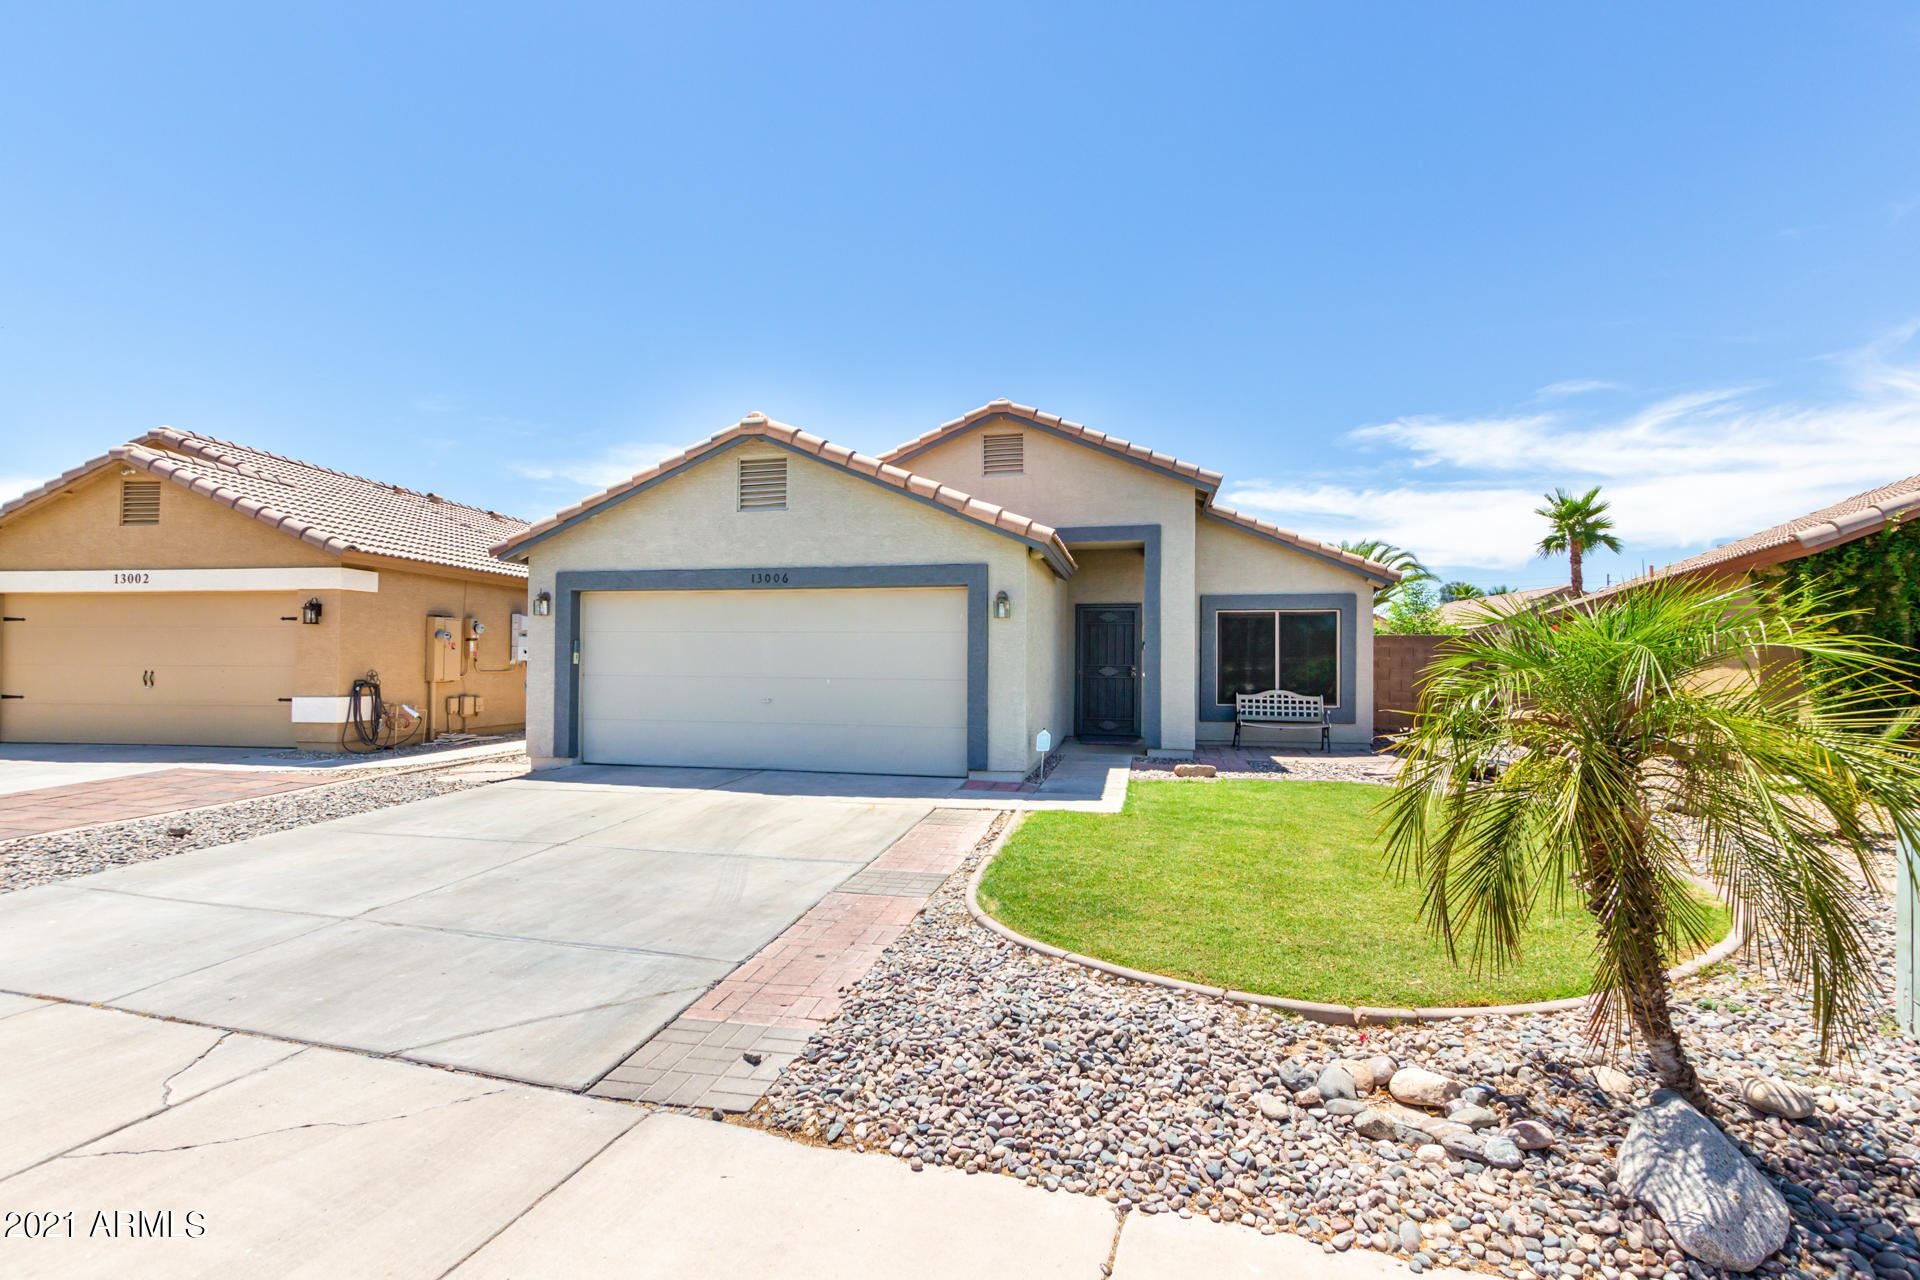 Photo of 13006 N 130TH Drive, El Mirage, AZ 85335 (MLS # 6248094)